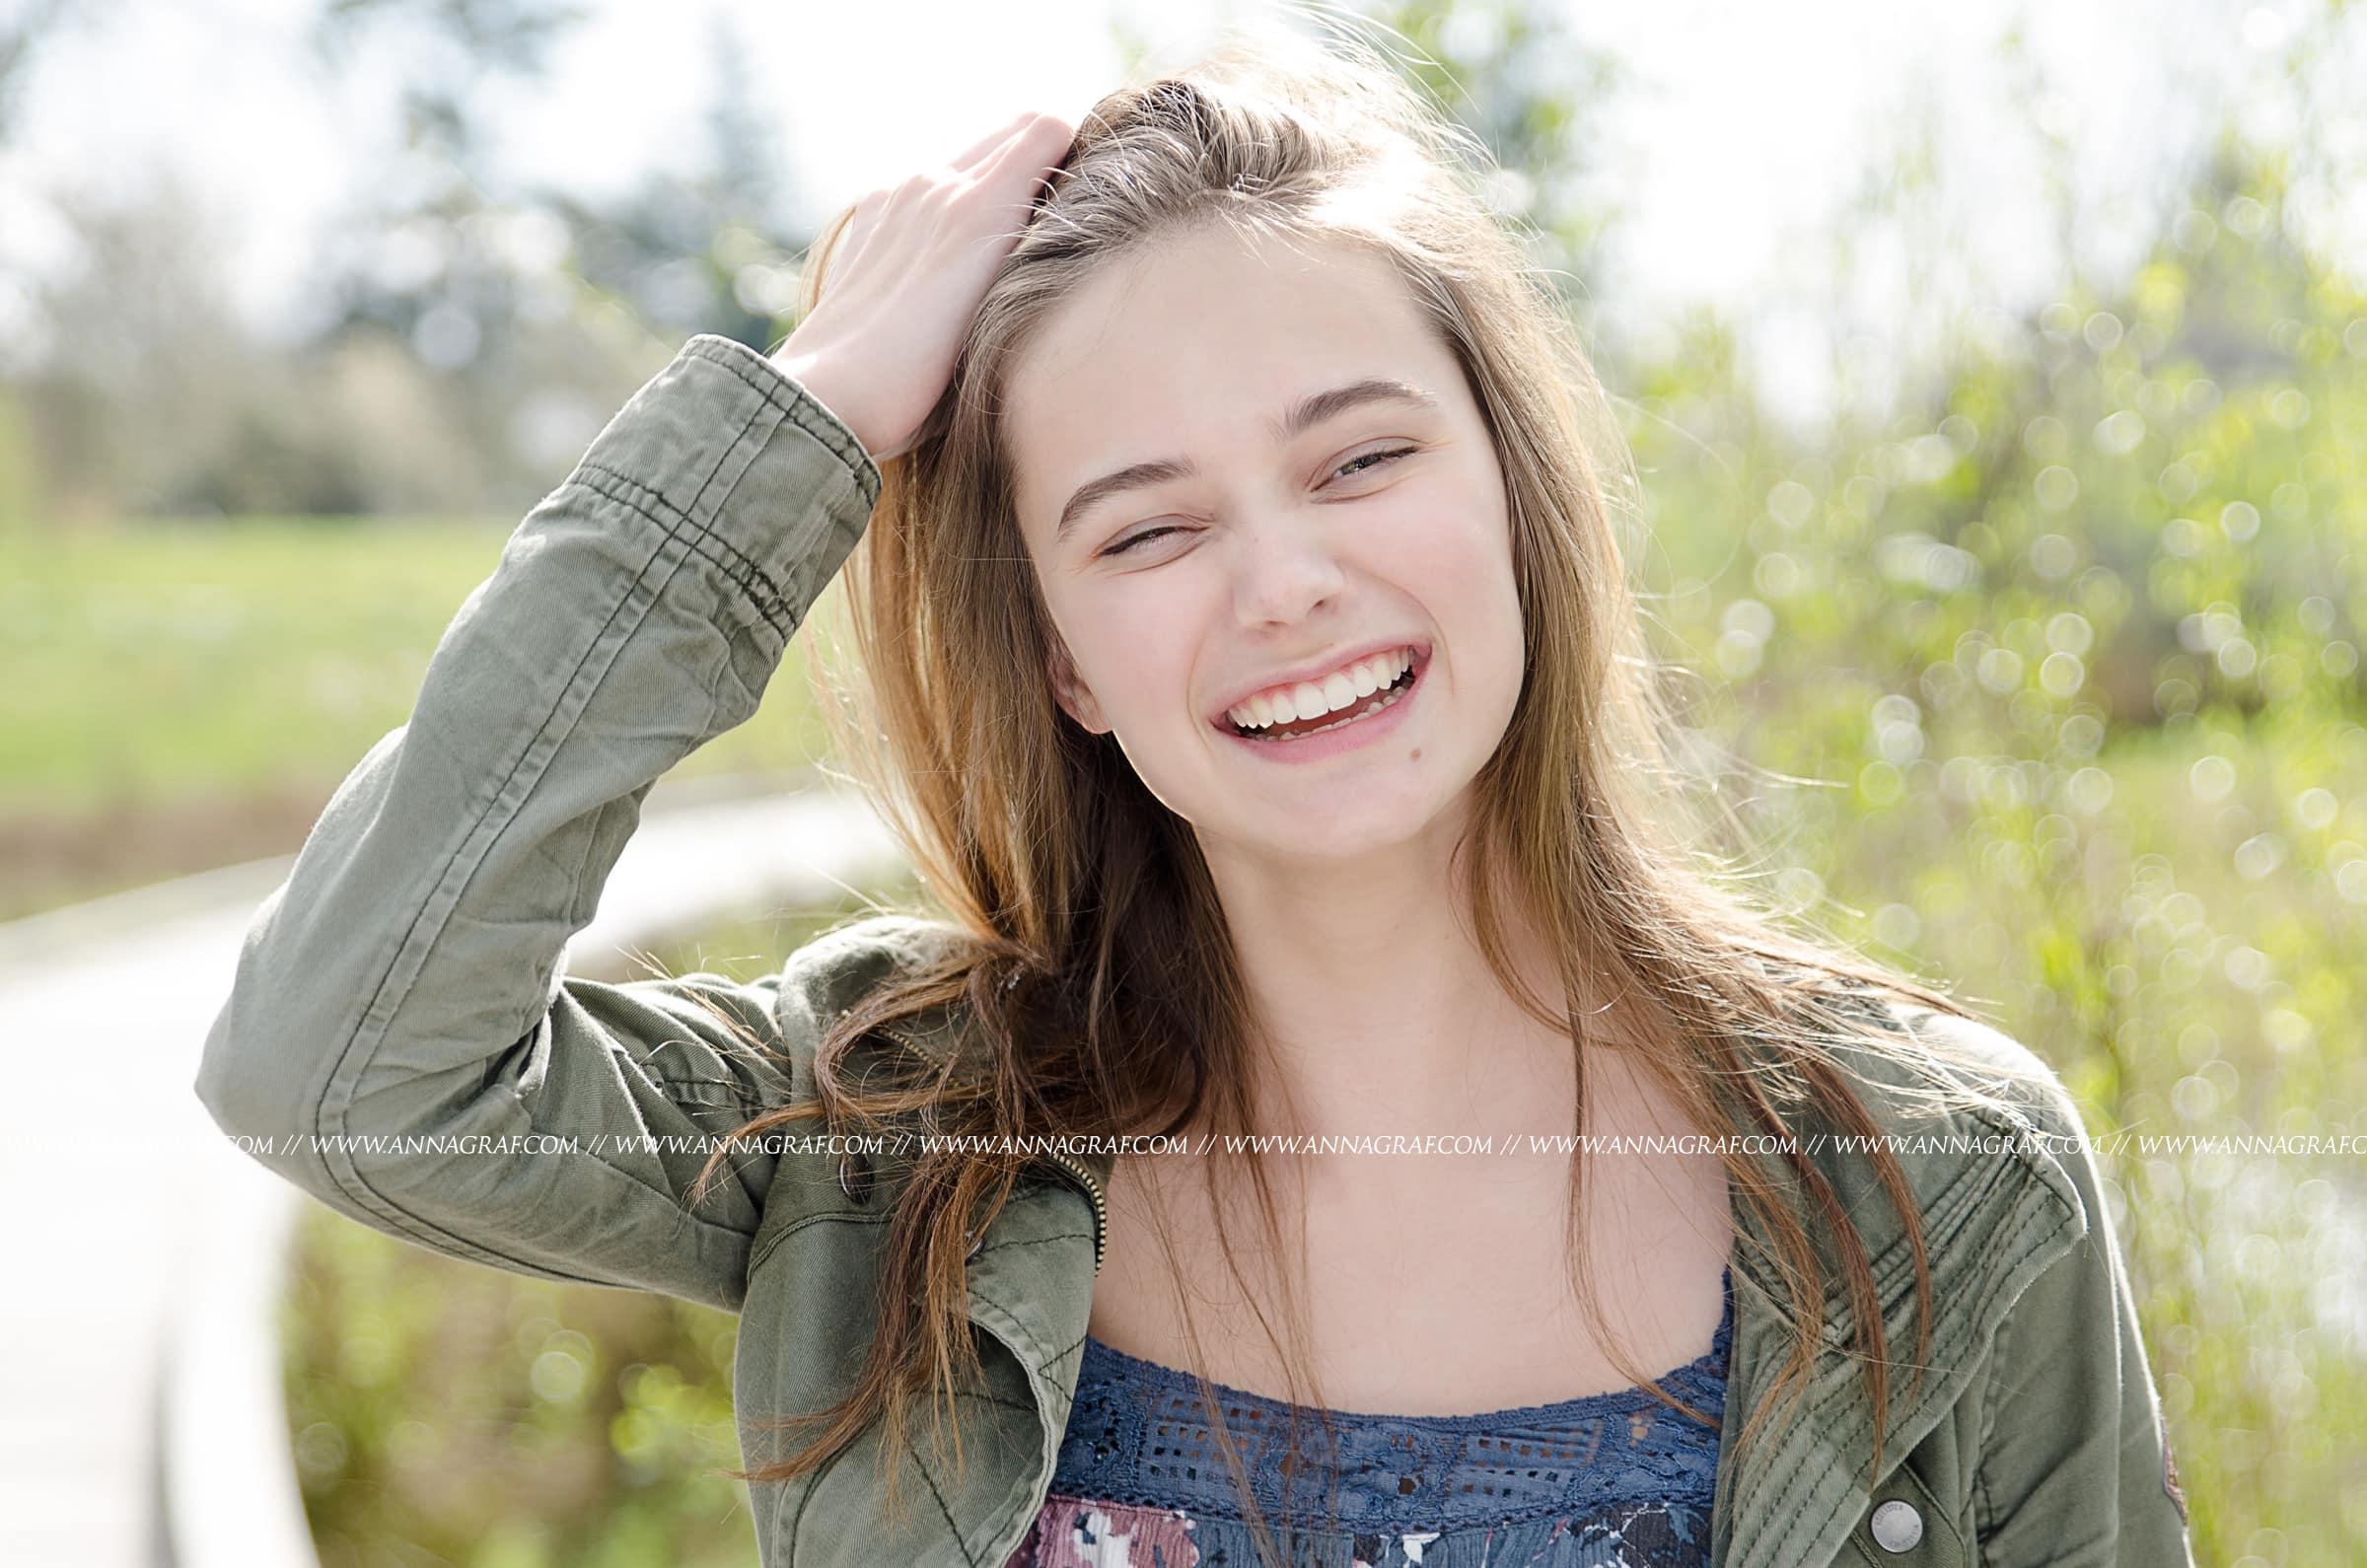 senior-pictures-portland-smiles-anna-graf-photography